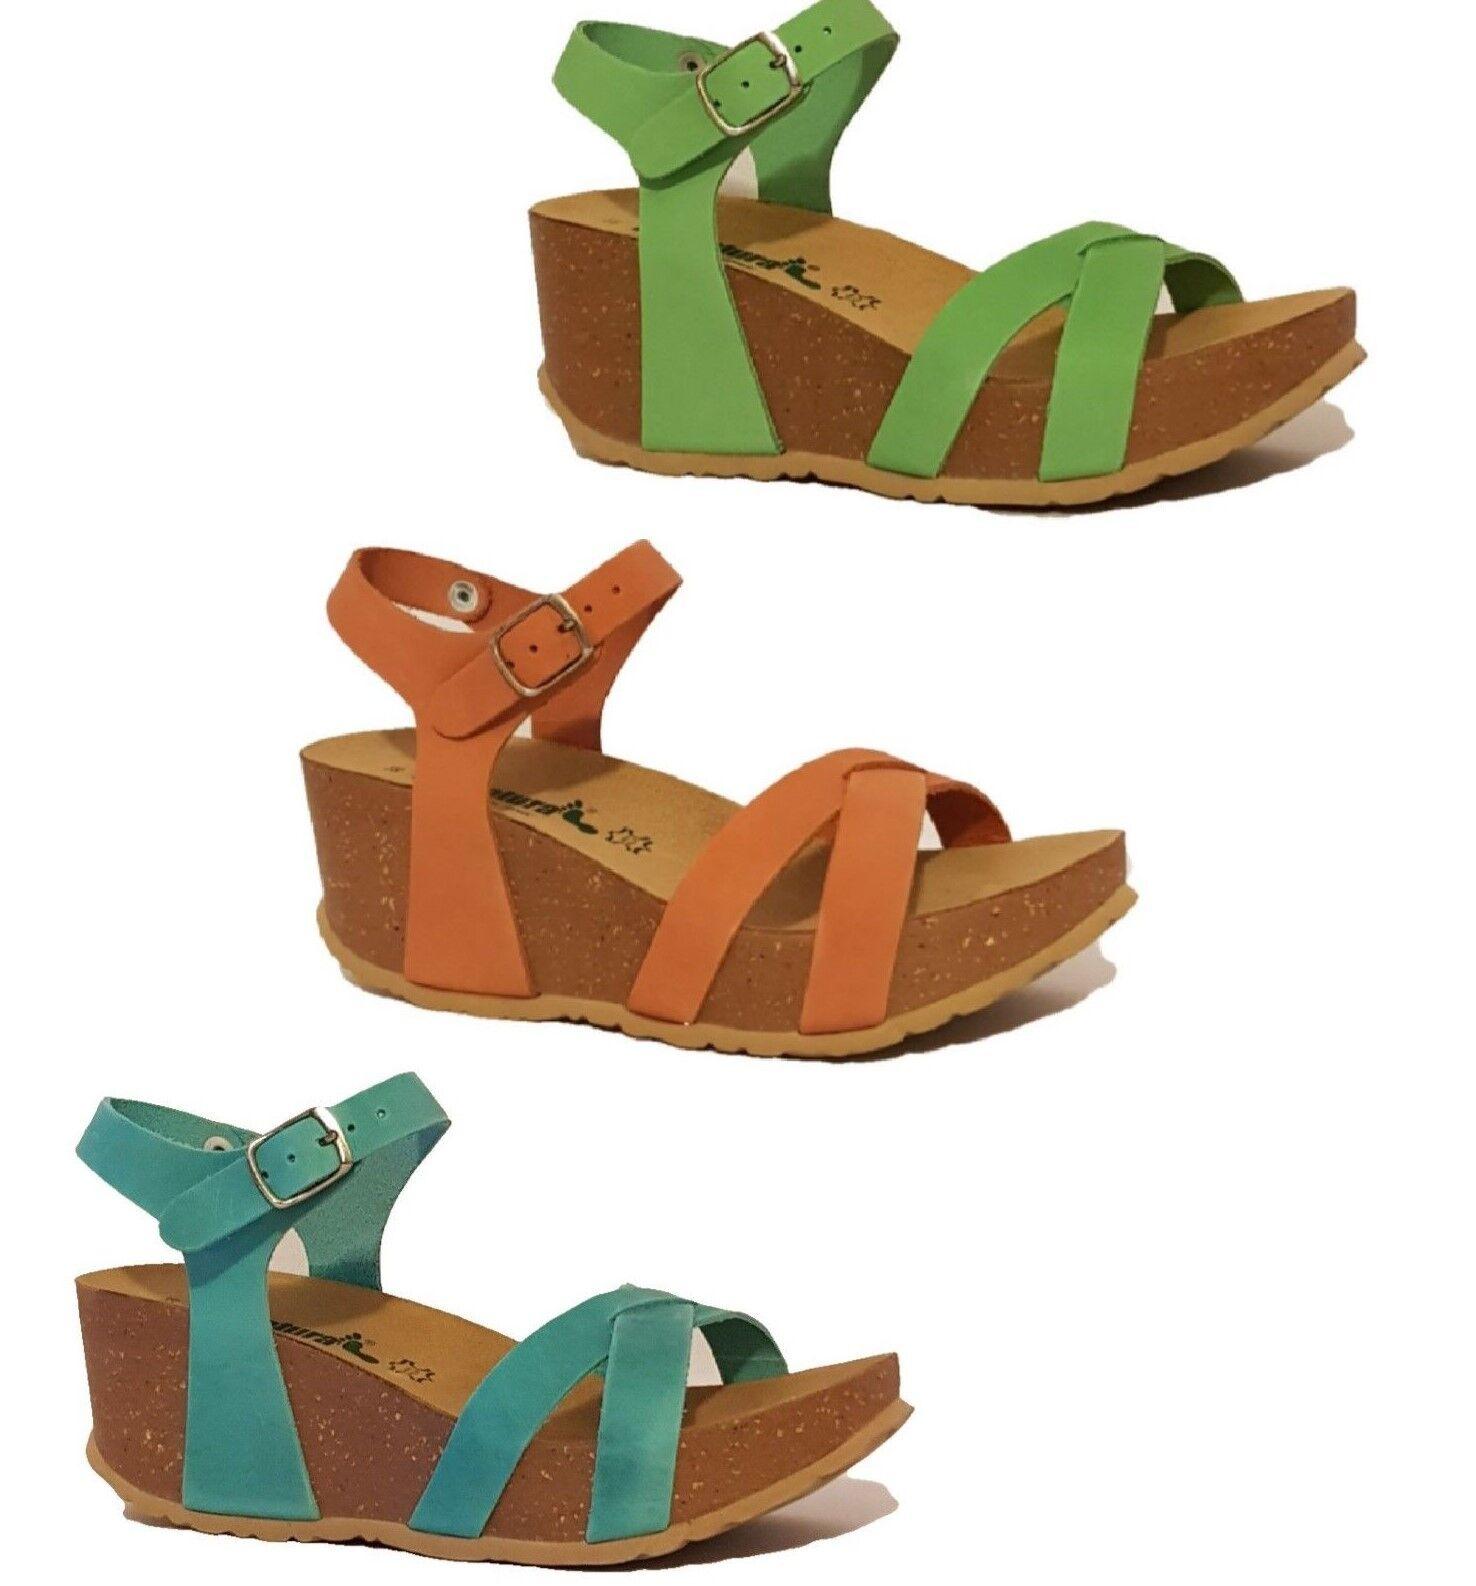 BioNatura 24 Fregene Orange, Turquoise bleu, vert, Nubuck Leather Wedge Sandals